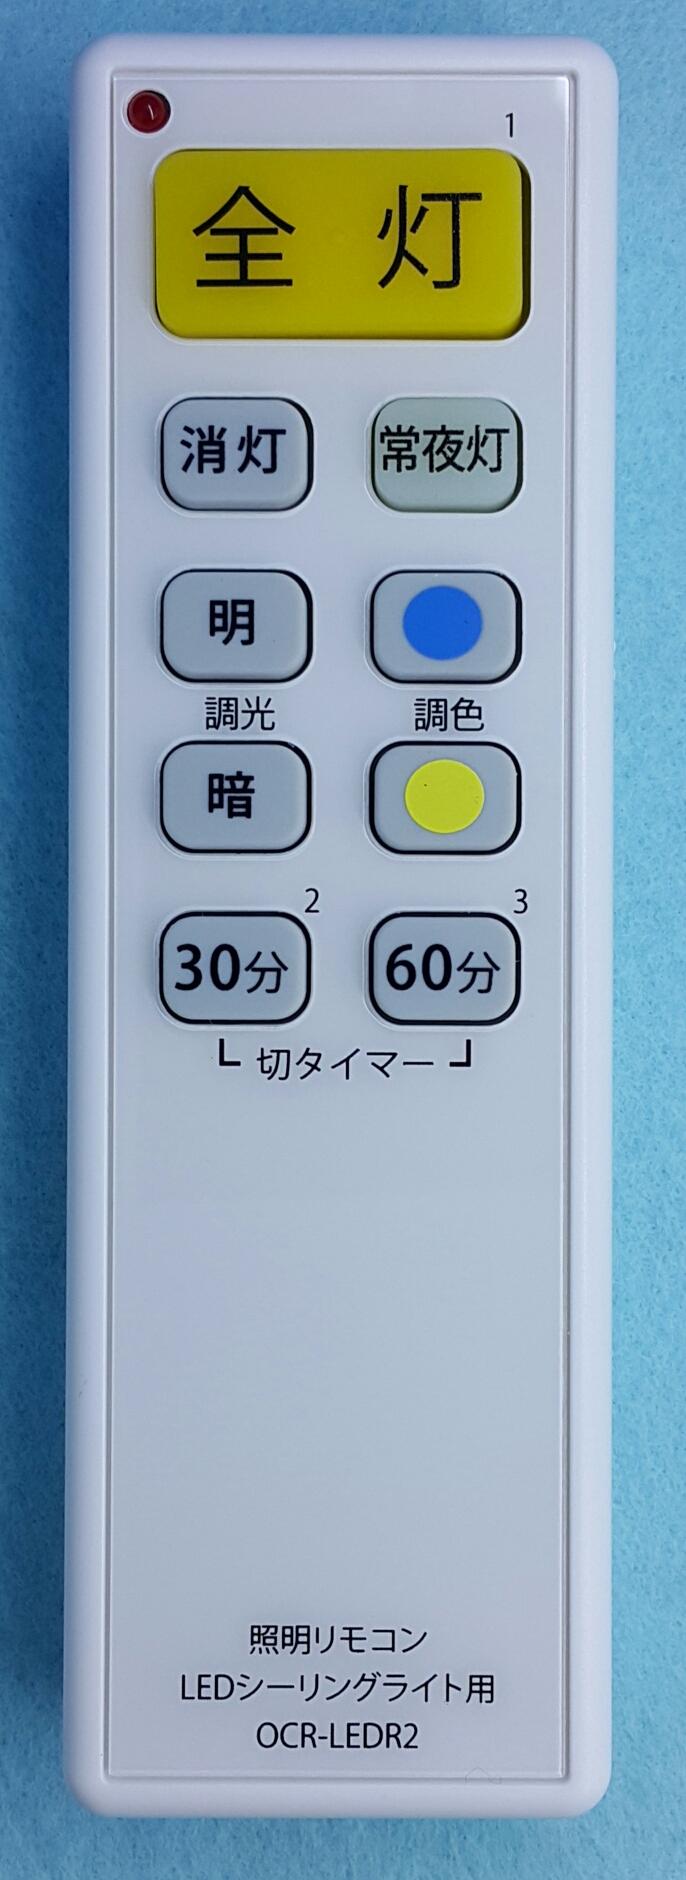 TAKIZUMI_OCR-LEDR2_1231_L214A 56A9_LAMP_cover.png